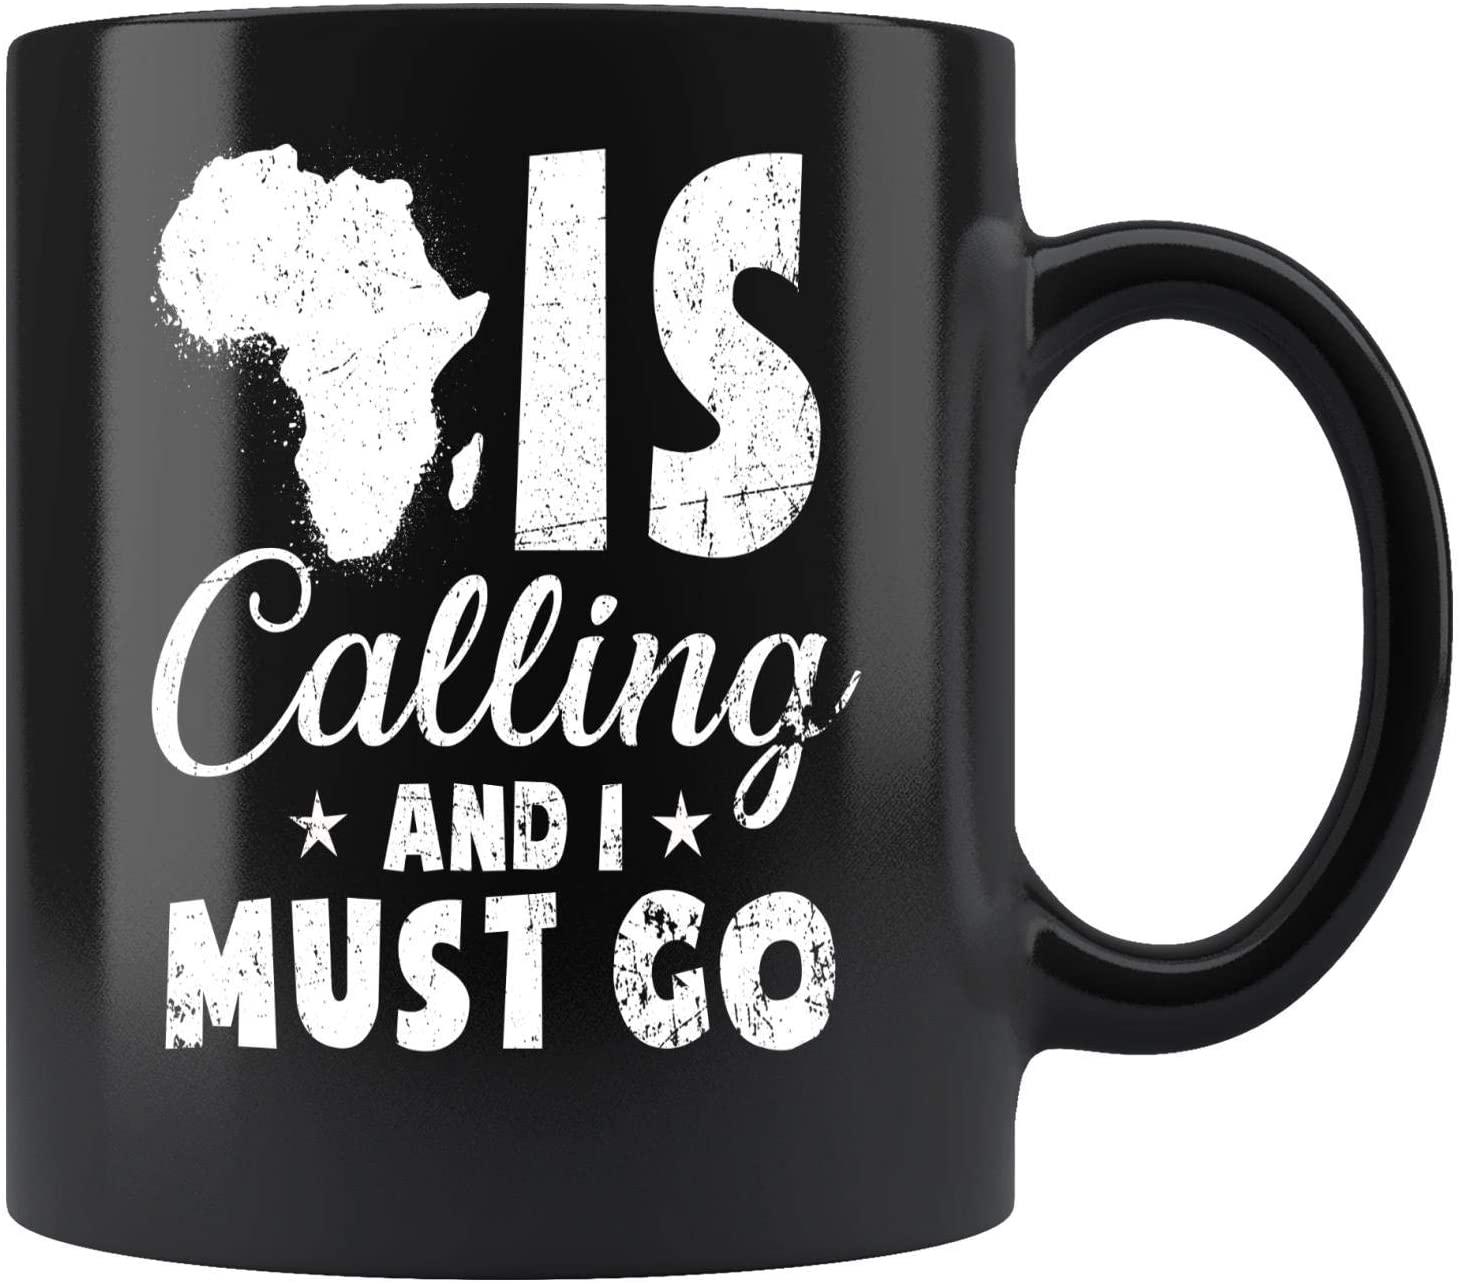 The African Is Calling And I Must Go Mug Coffee Mug 11oz Gift Tea Cups 15oz